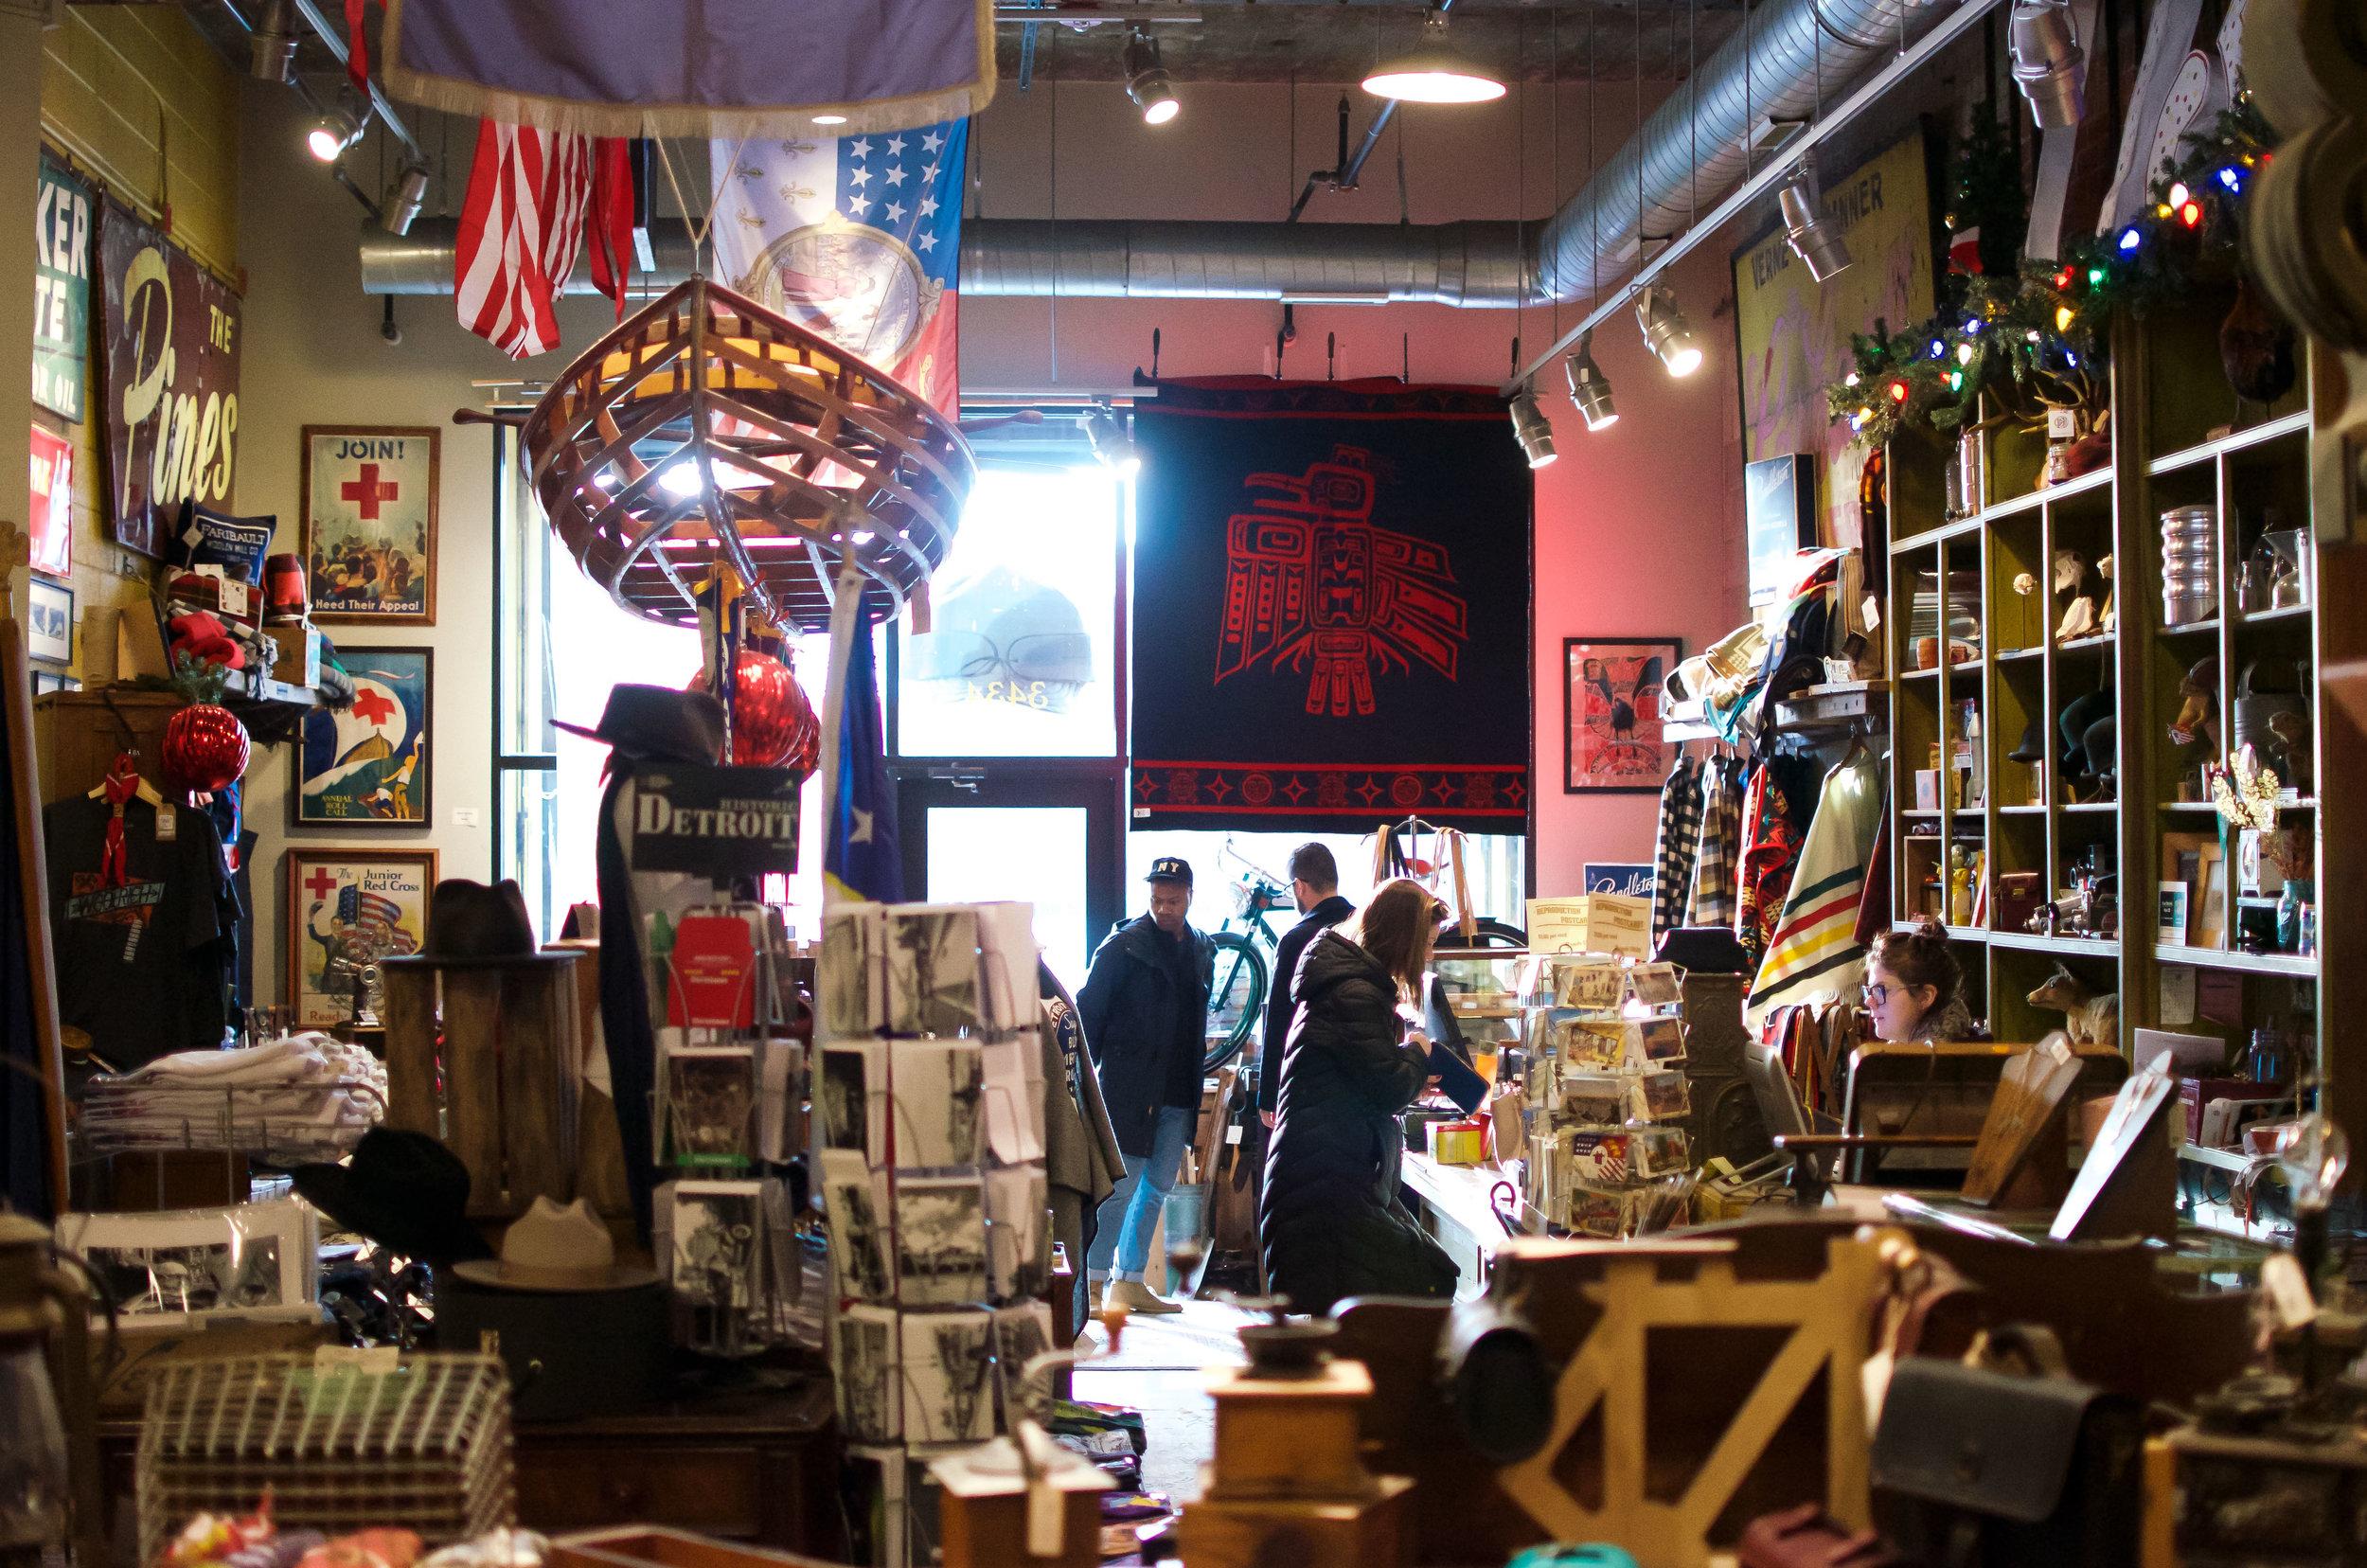 Wendling_Boyd_Detroit_Mercantile_Makers_American_Made-11.jpg